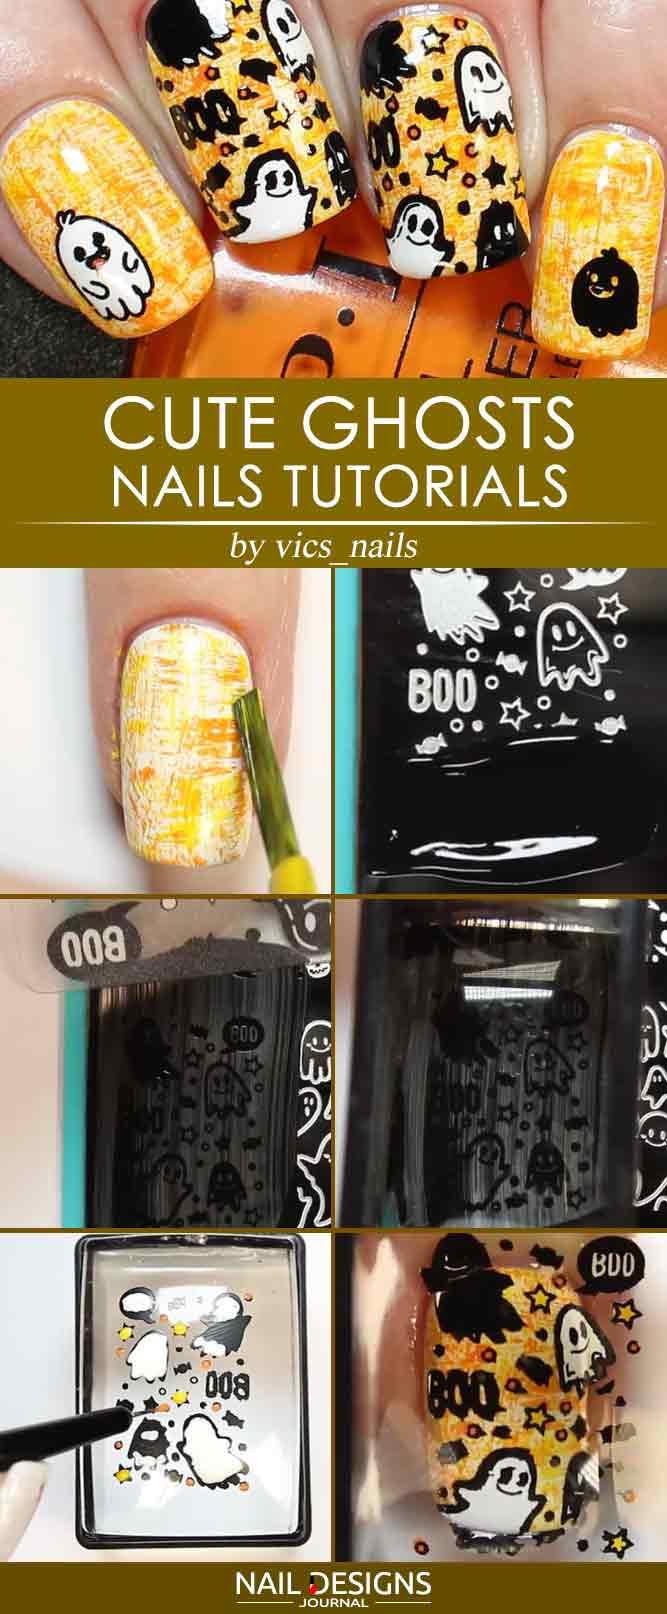 Cute Ghosts Nails Tutorial